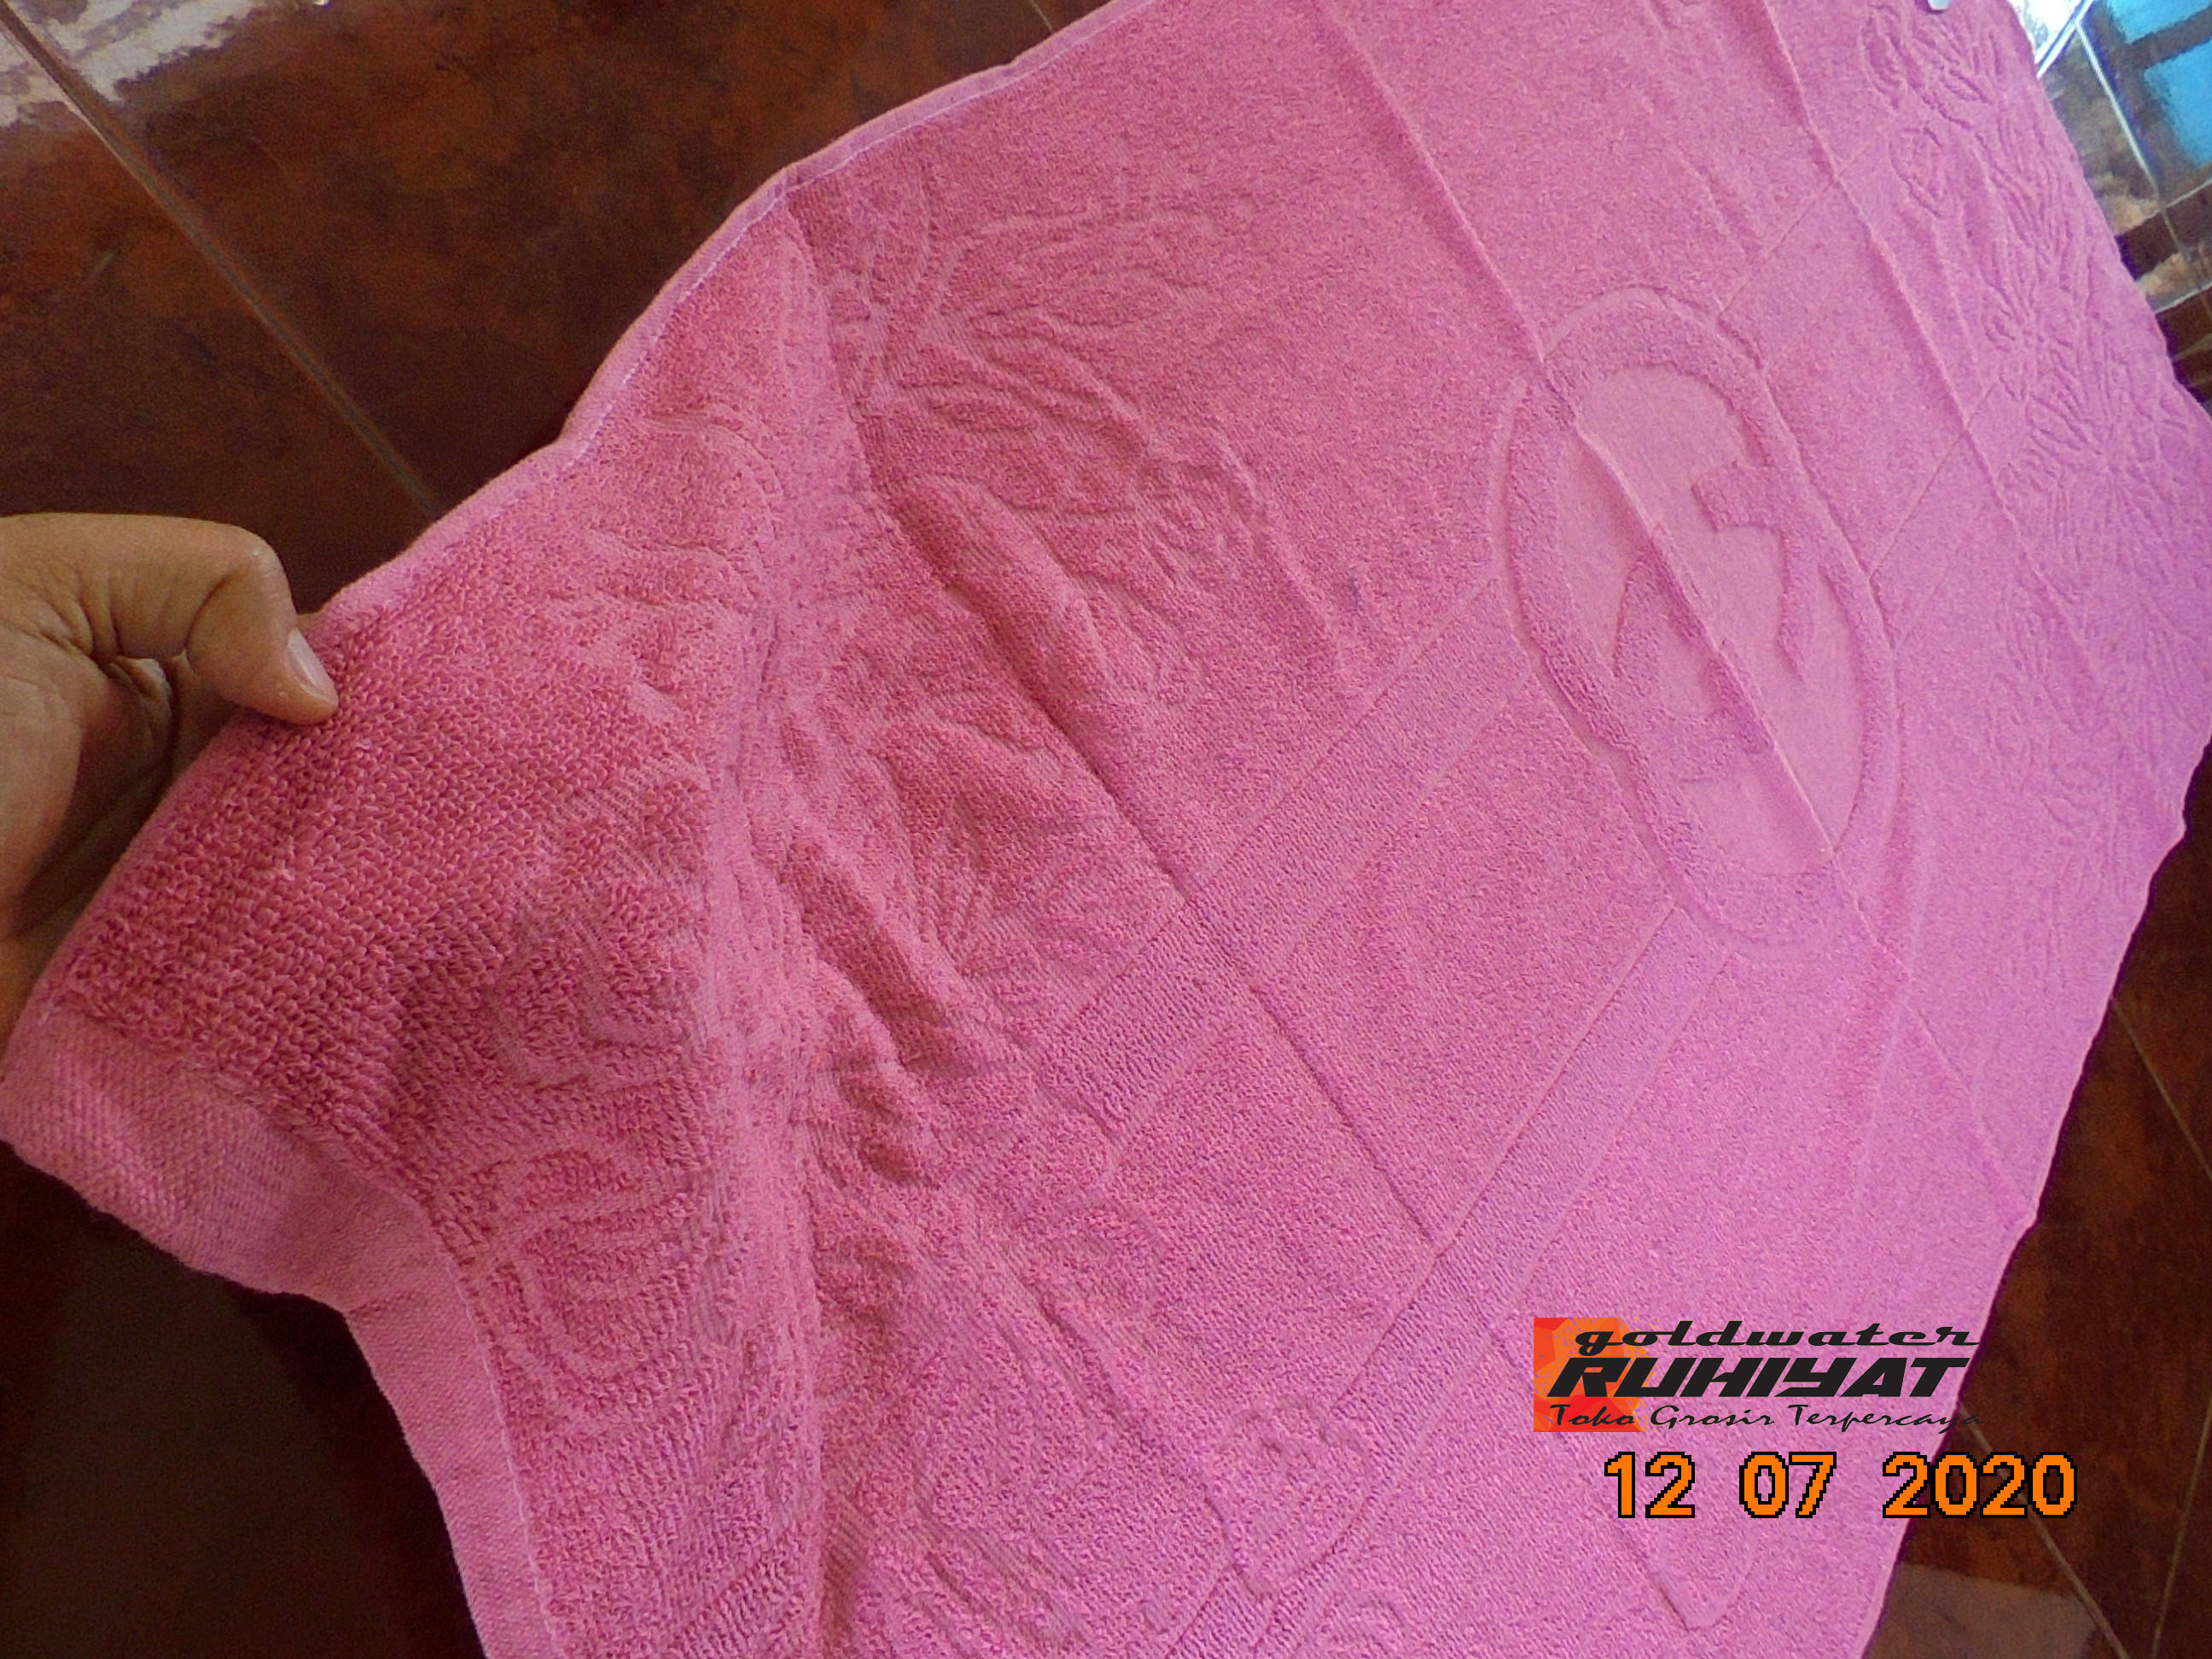 handuk gucci pbunga katun 100% 143x73 original tebal menyerap air lembut kualitas garansi